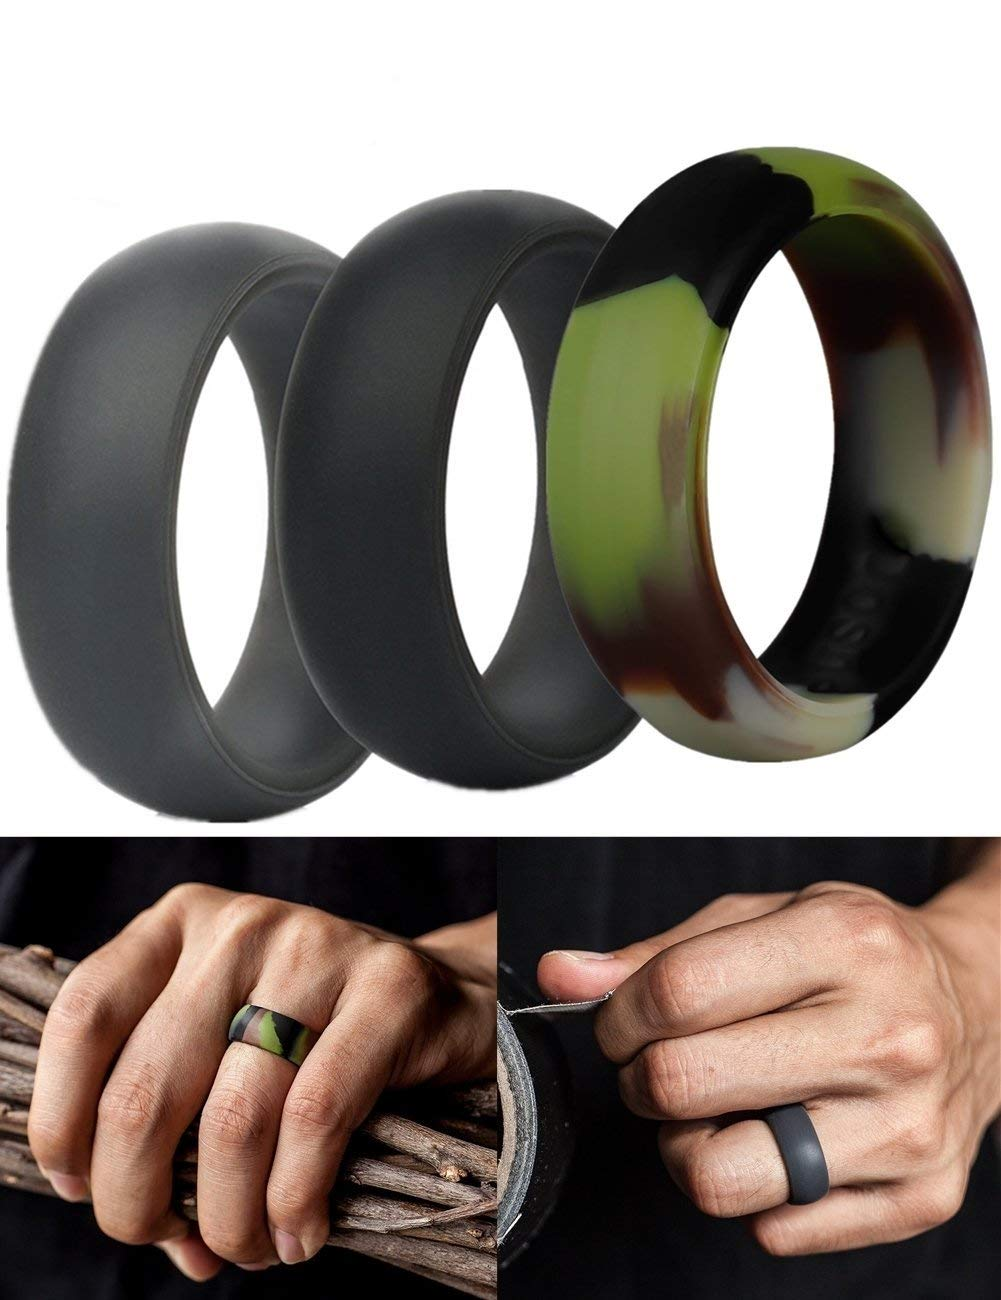 Silicone Rings Wedding, Runfish Affordable Silicone Rubber Band for Men Silicone Rubber Ring 3-Pack, Black, Camo, Grey, Size 12